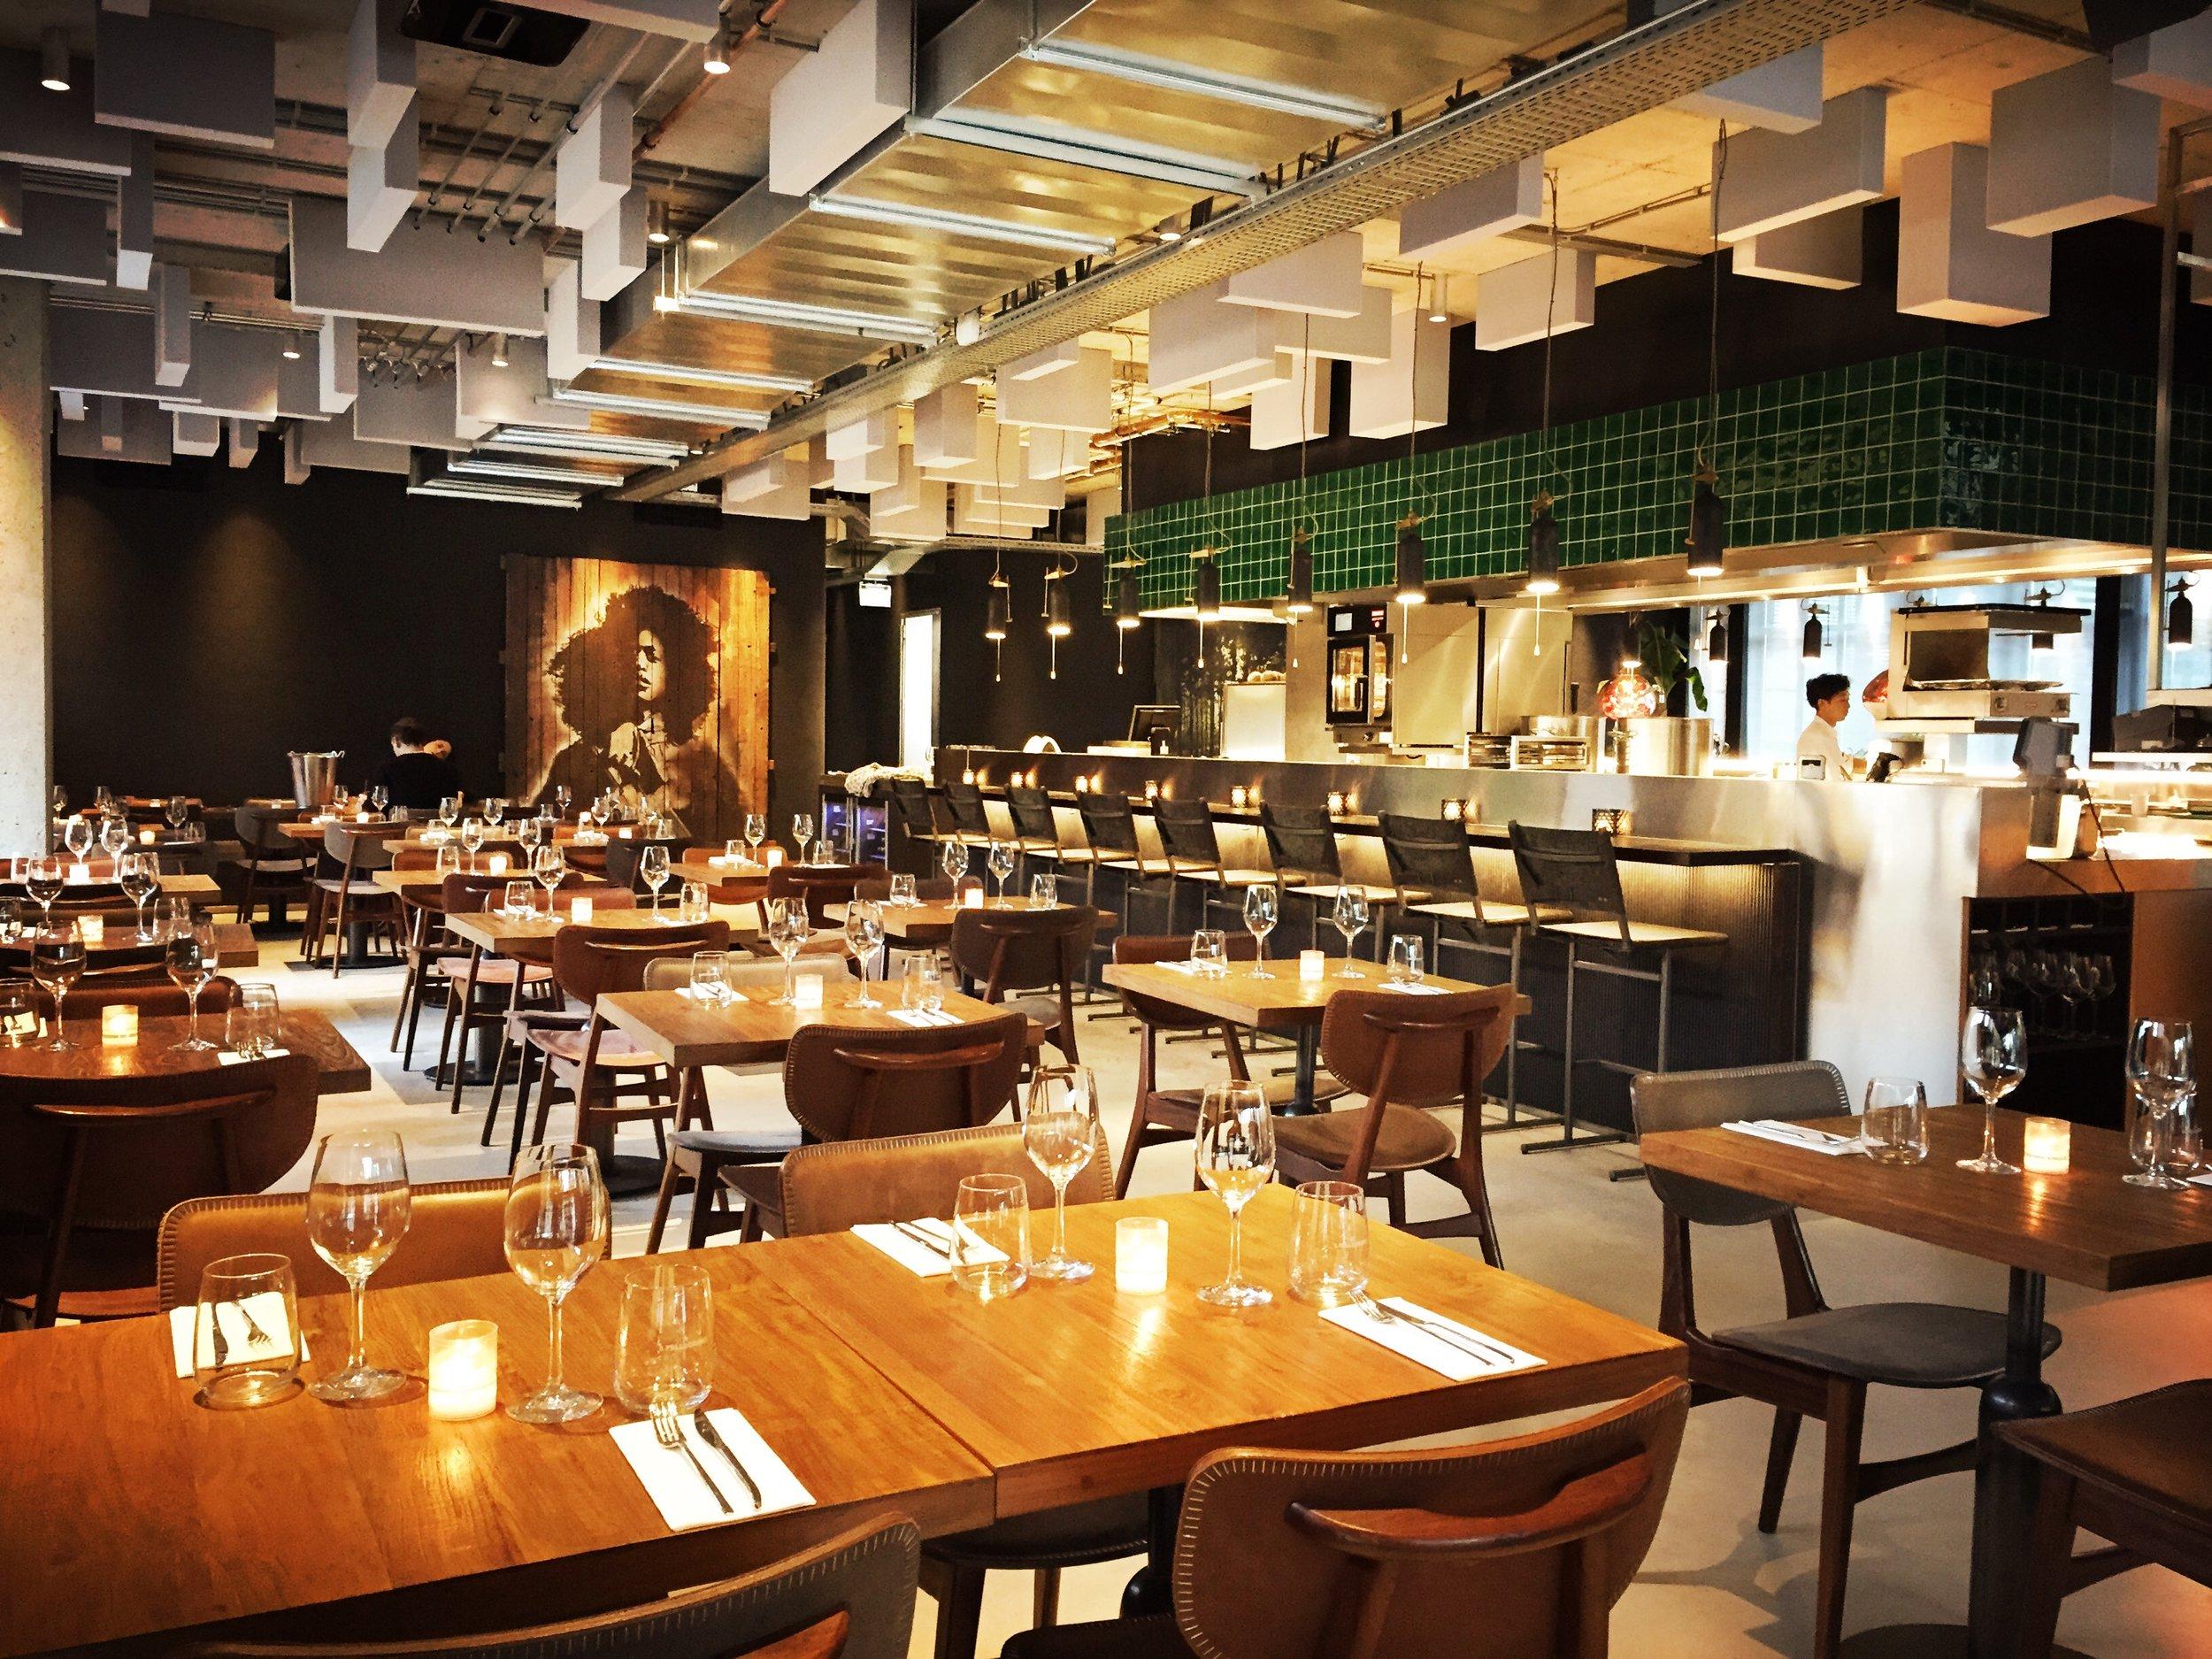 StudioNoun-InteriorDesignProject-Restaurant-RestaurantC7.jpg